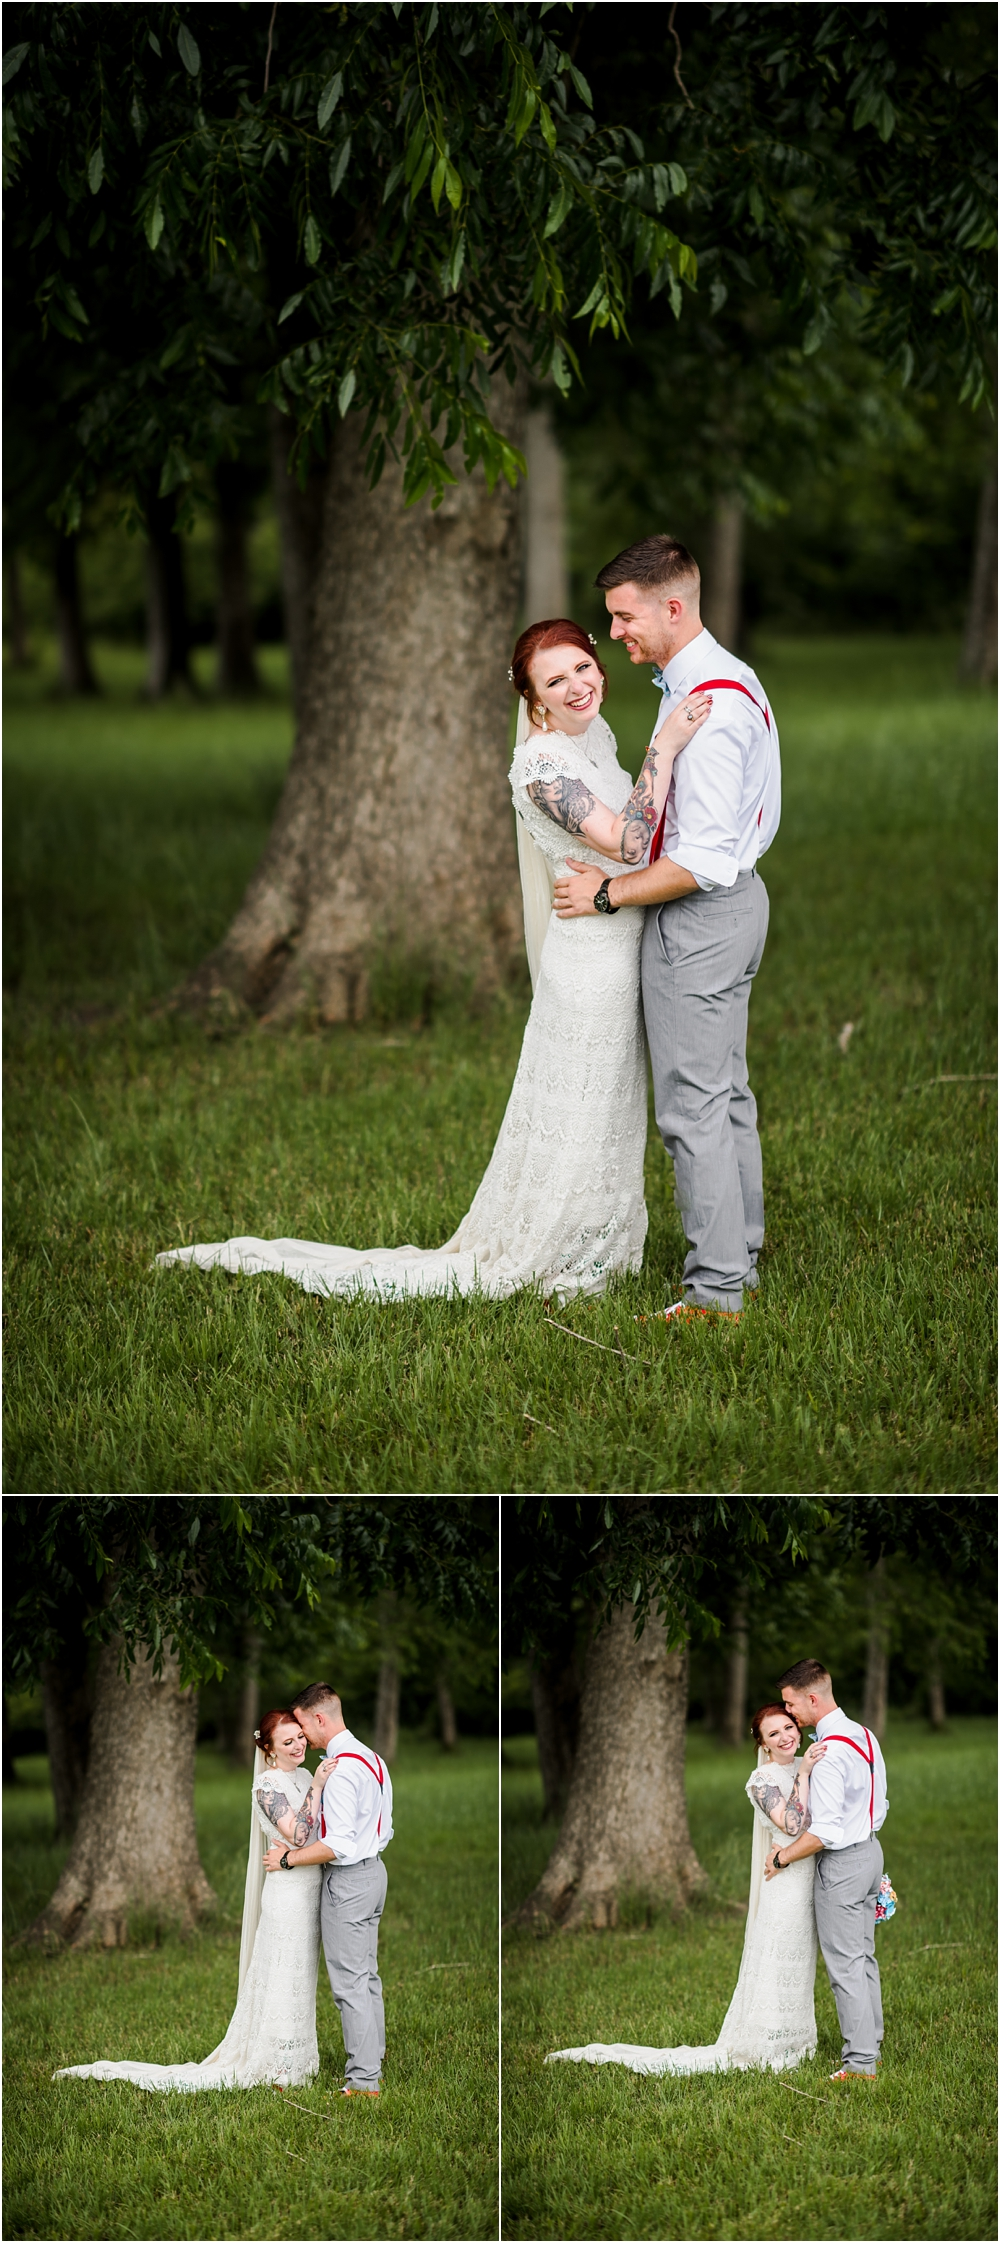 the-barn-at-wateroaks-circus-florida-wedding-photographer-kiersten-stevenson-photography-75.jpg